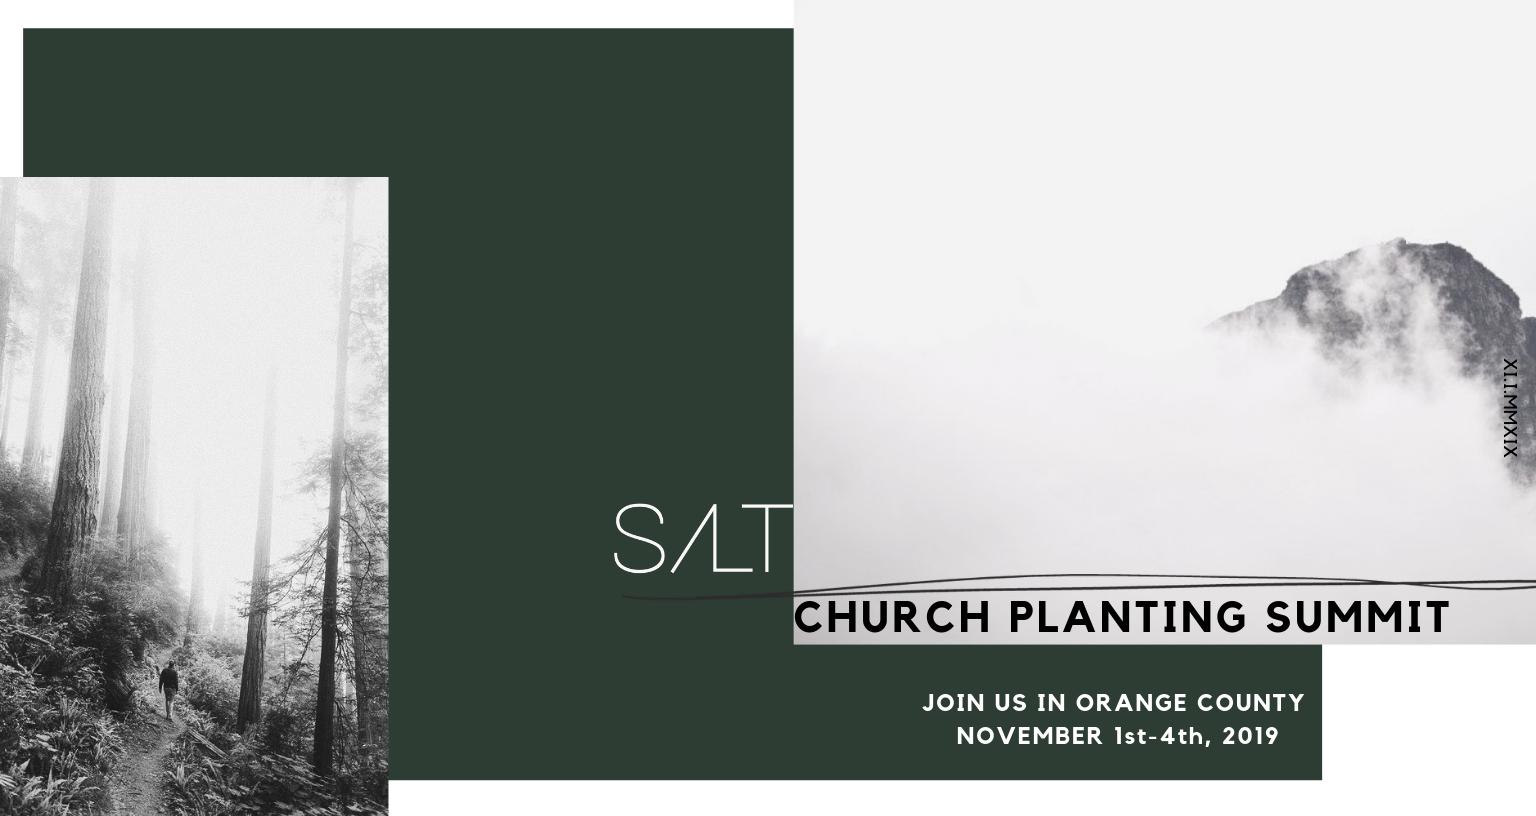 church planting summit (2).png